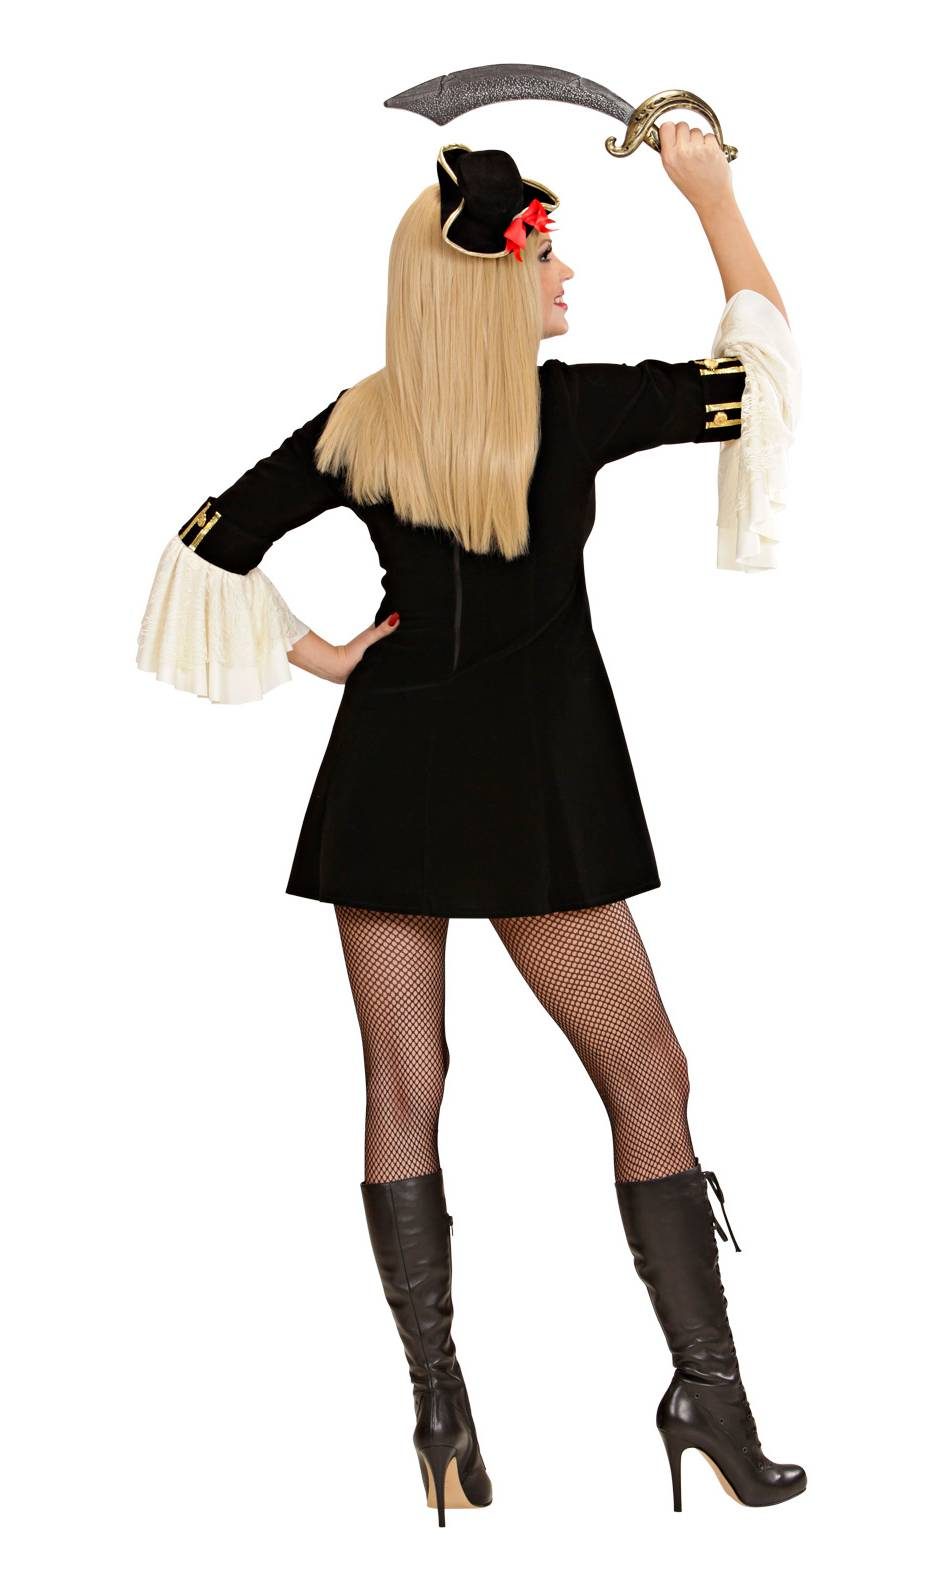 Costume-de-pirate-femme-2